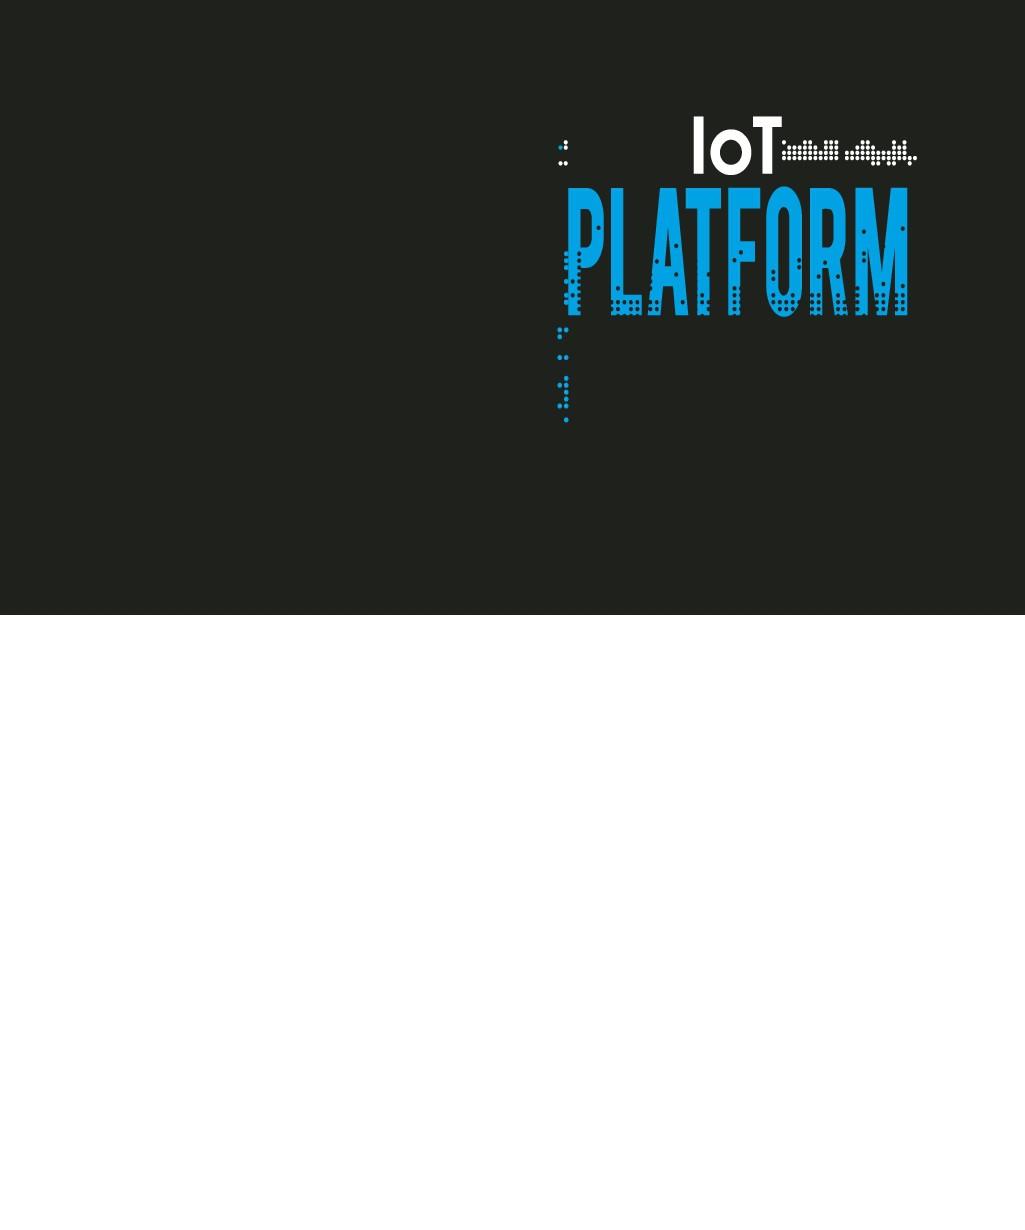 IoT platform t-shirt